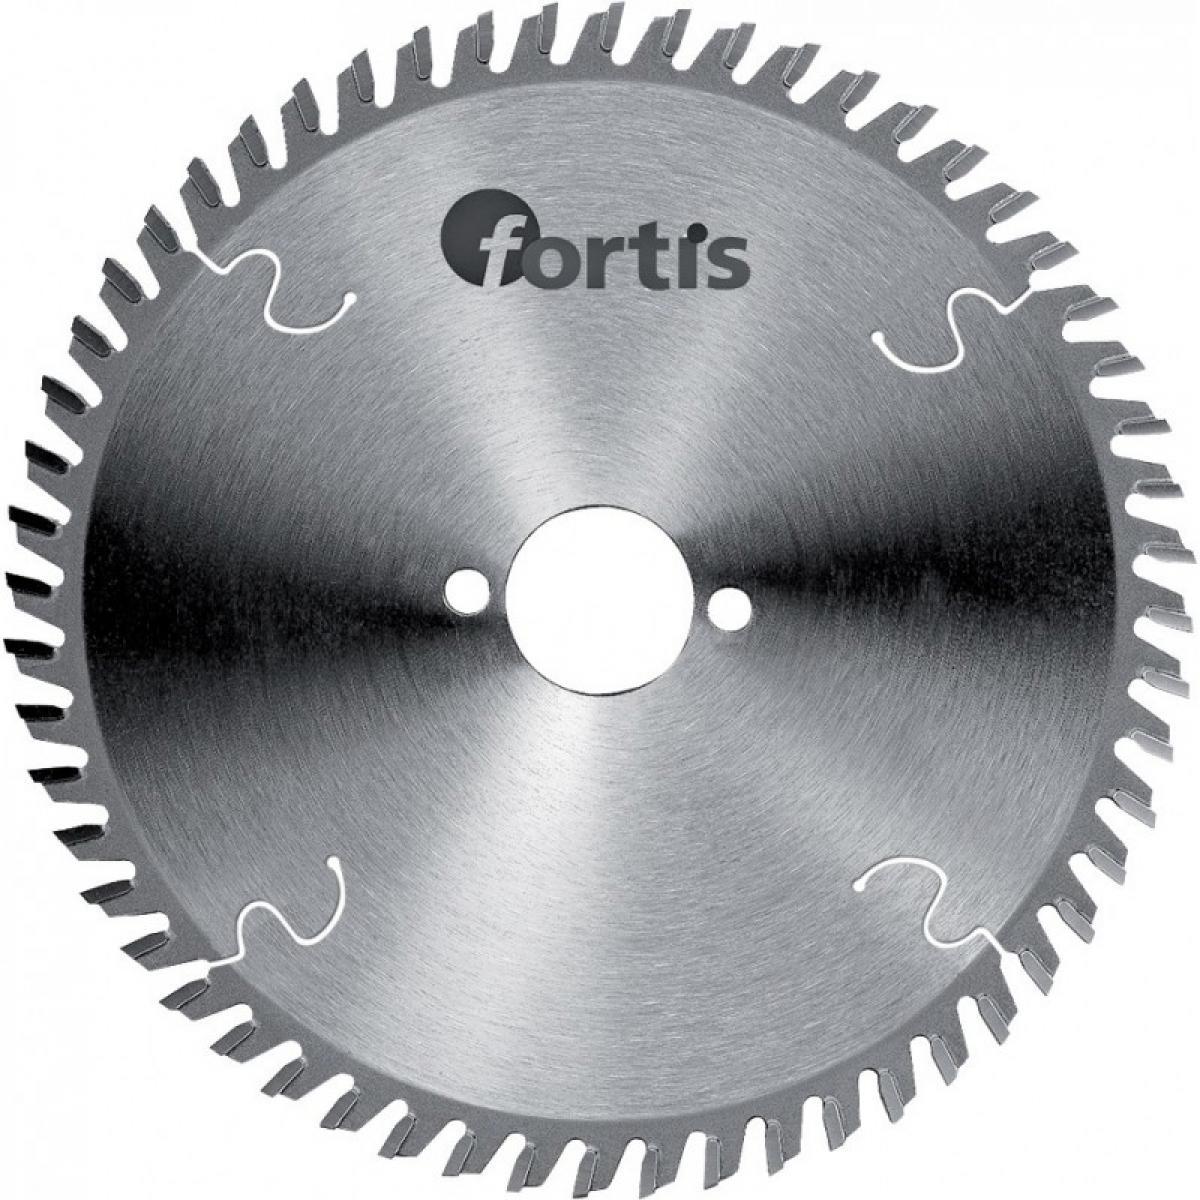 Fortis HW-Lame scie 216x3,0 x30mm Z64Wneg. Fortis